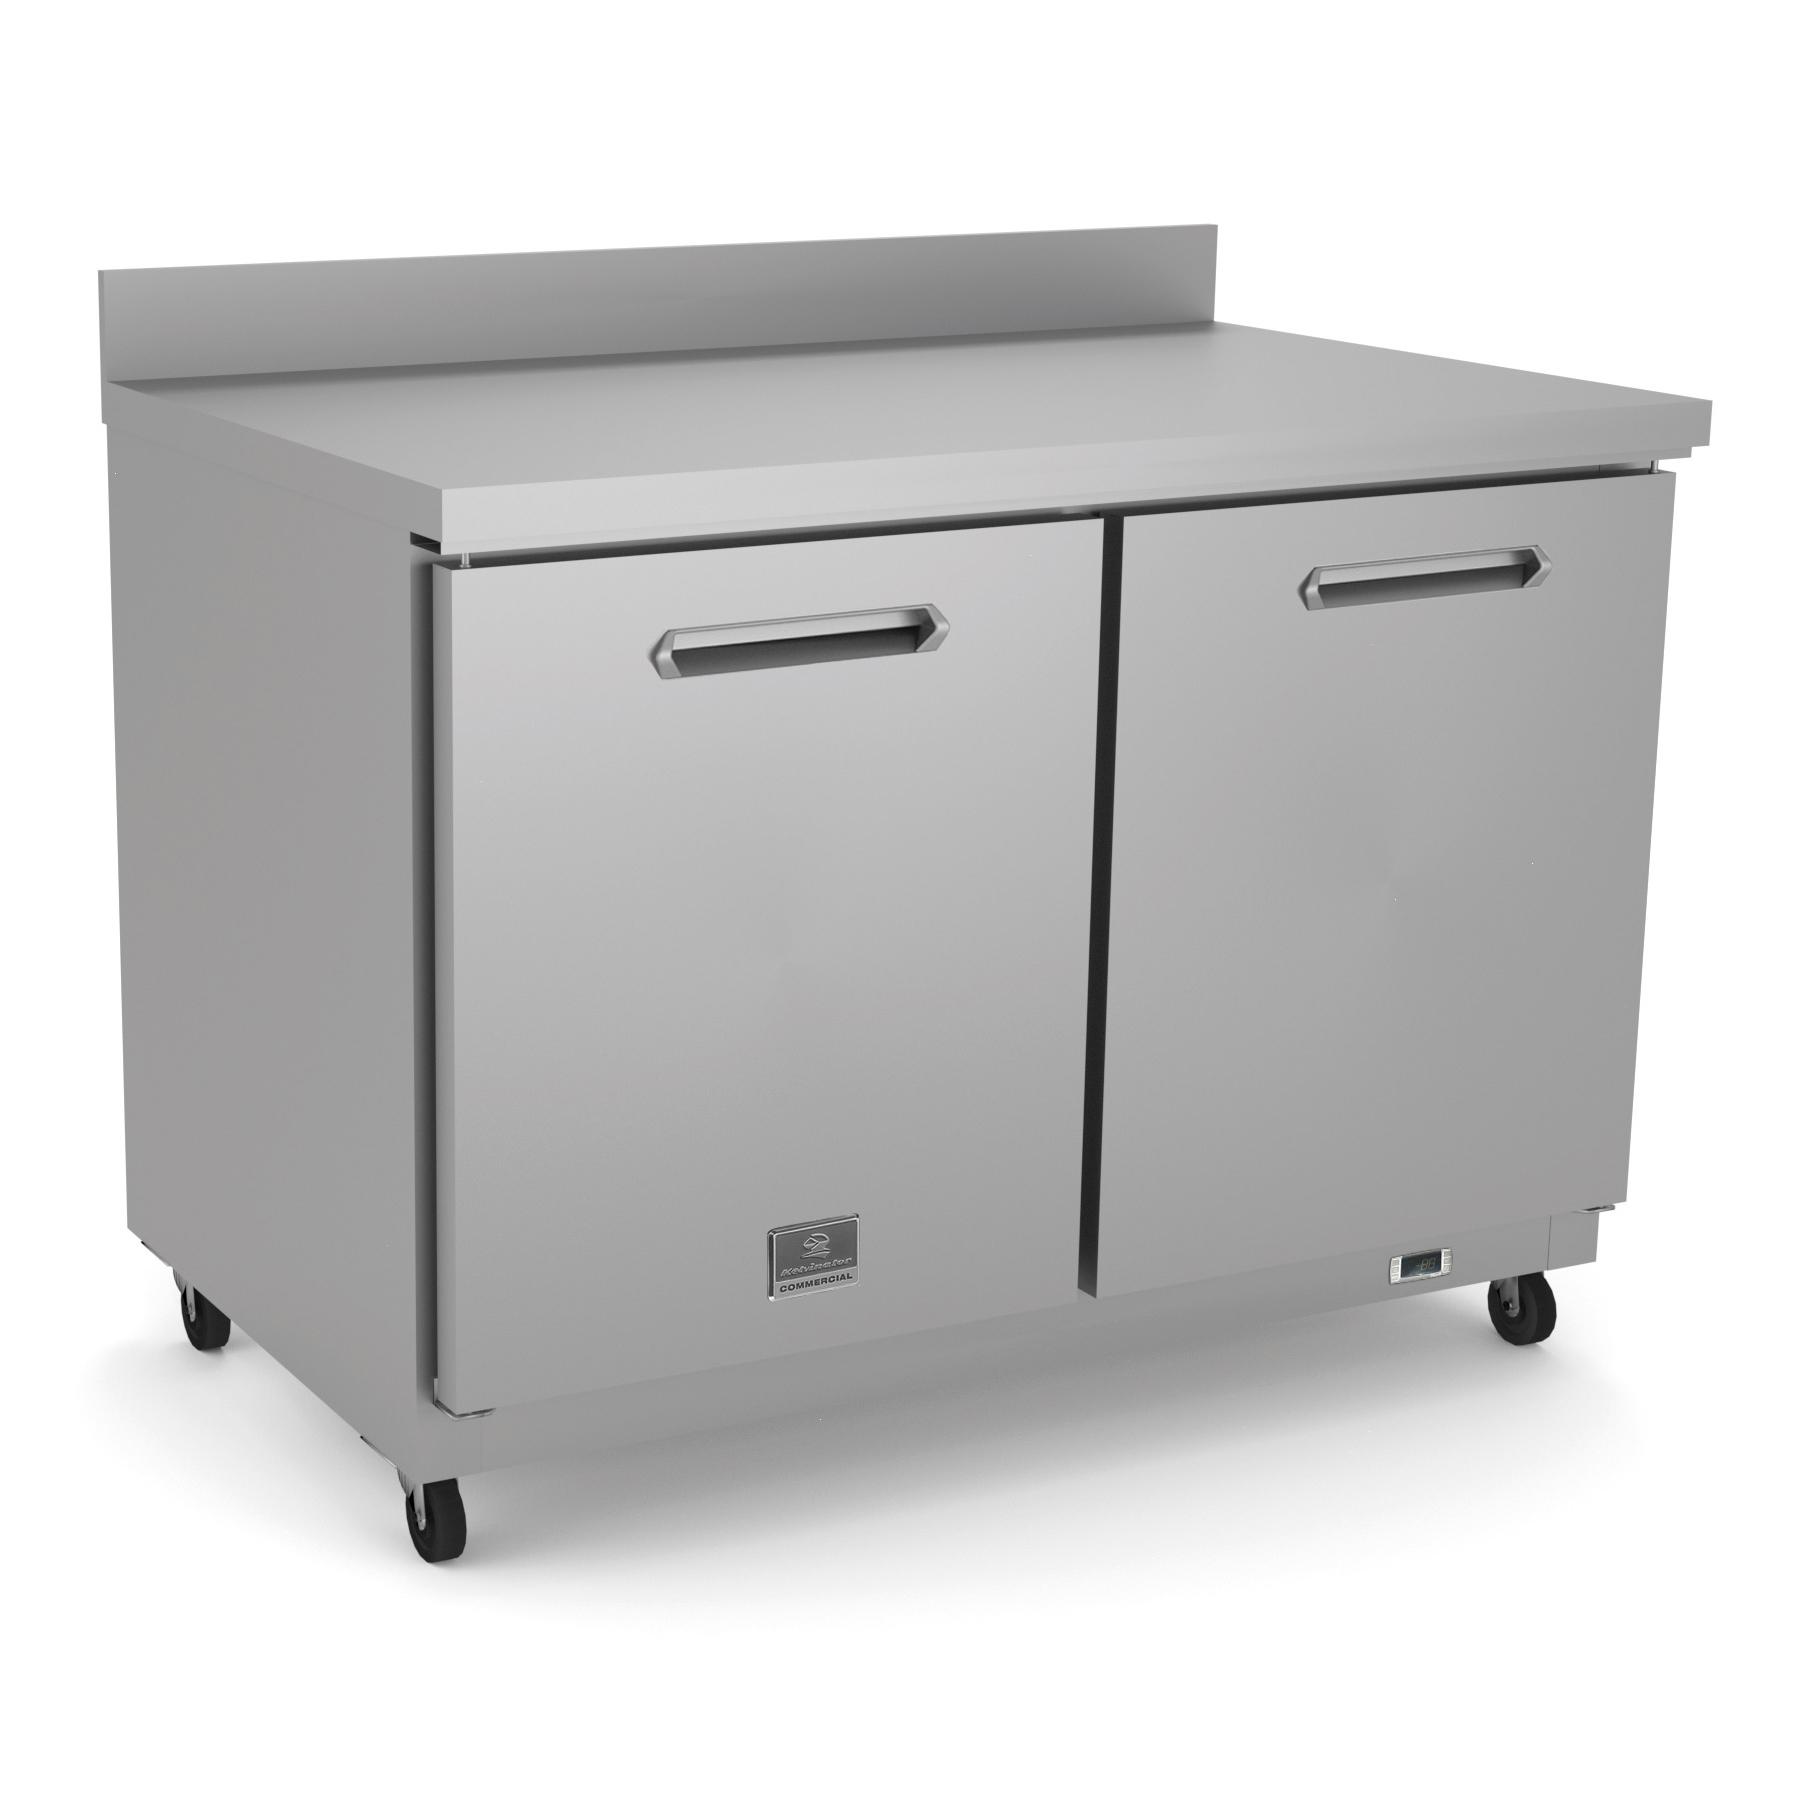 Kelvinator Commercial KCHUCWT48R refrigerator, undercounter, reach-in